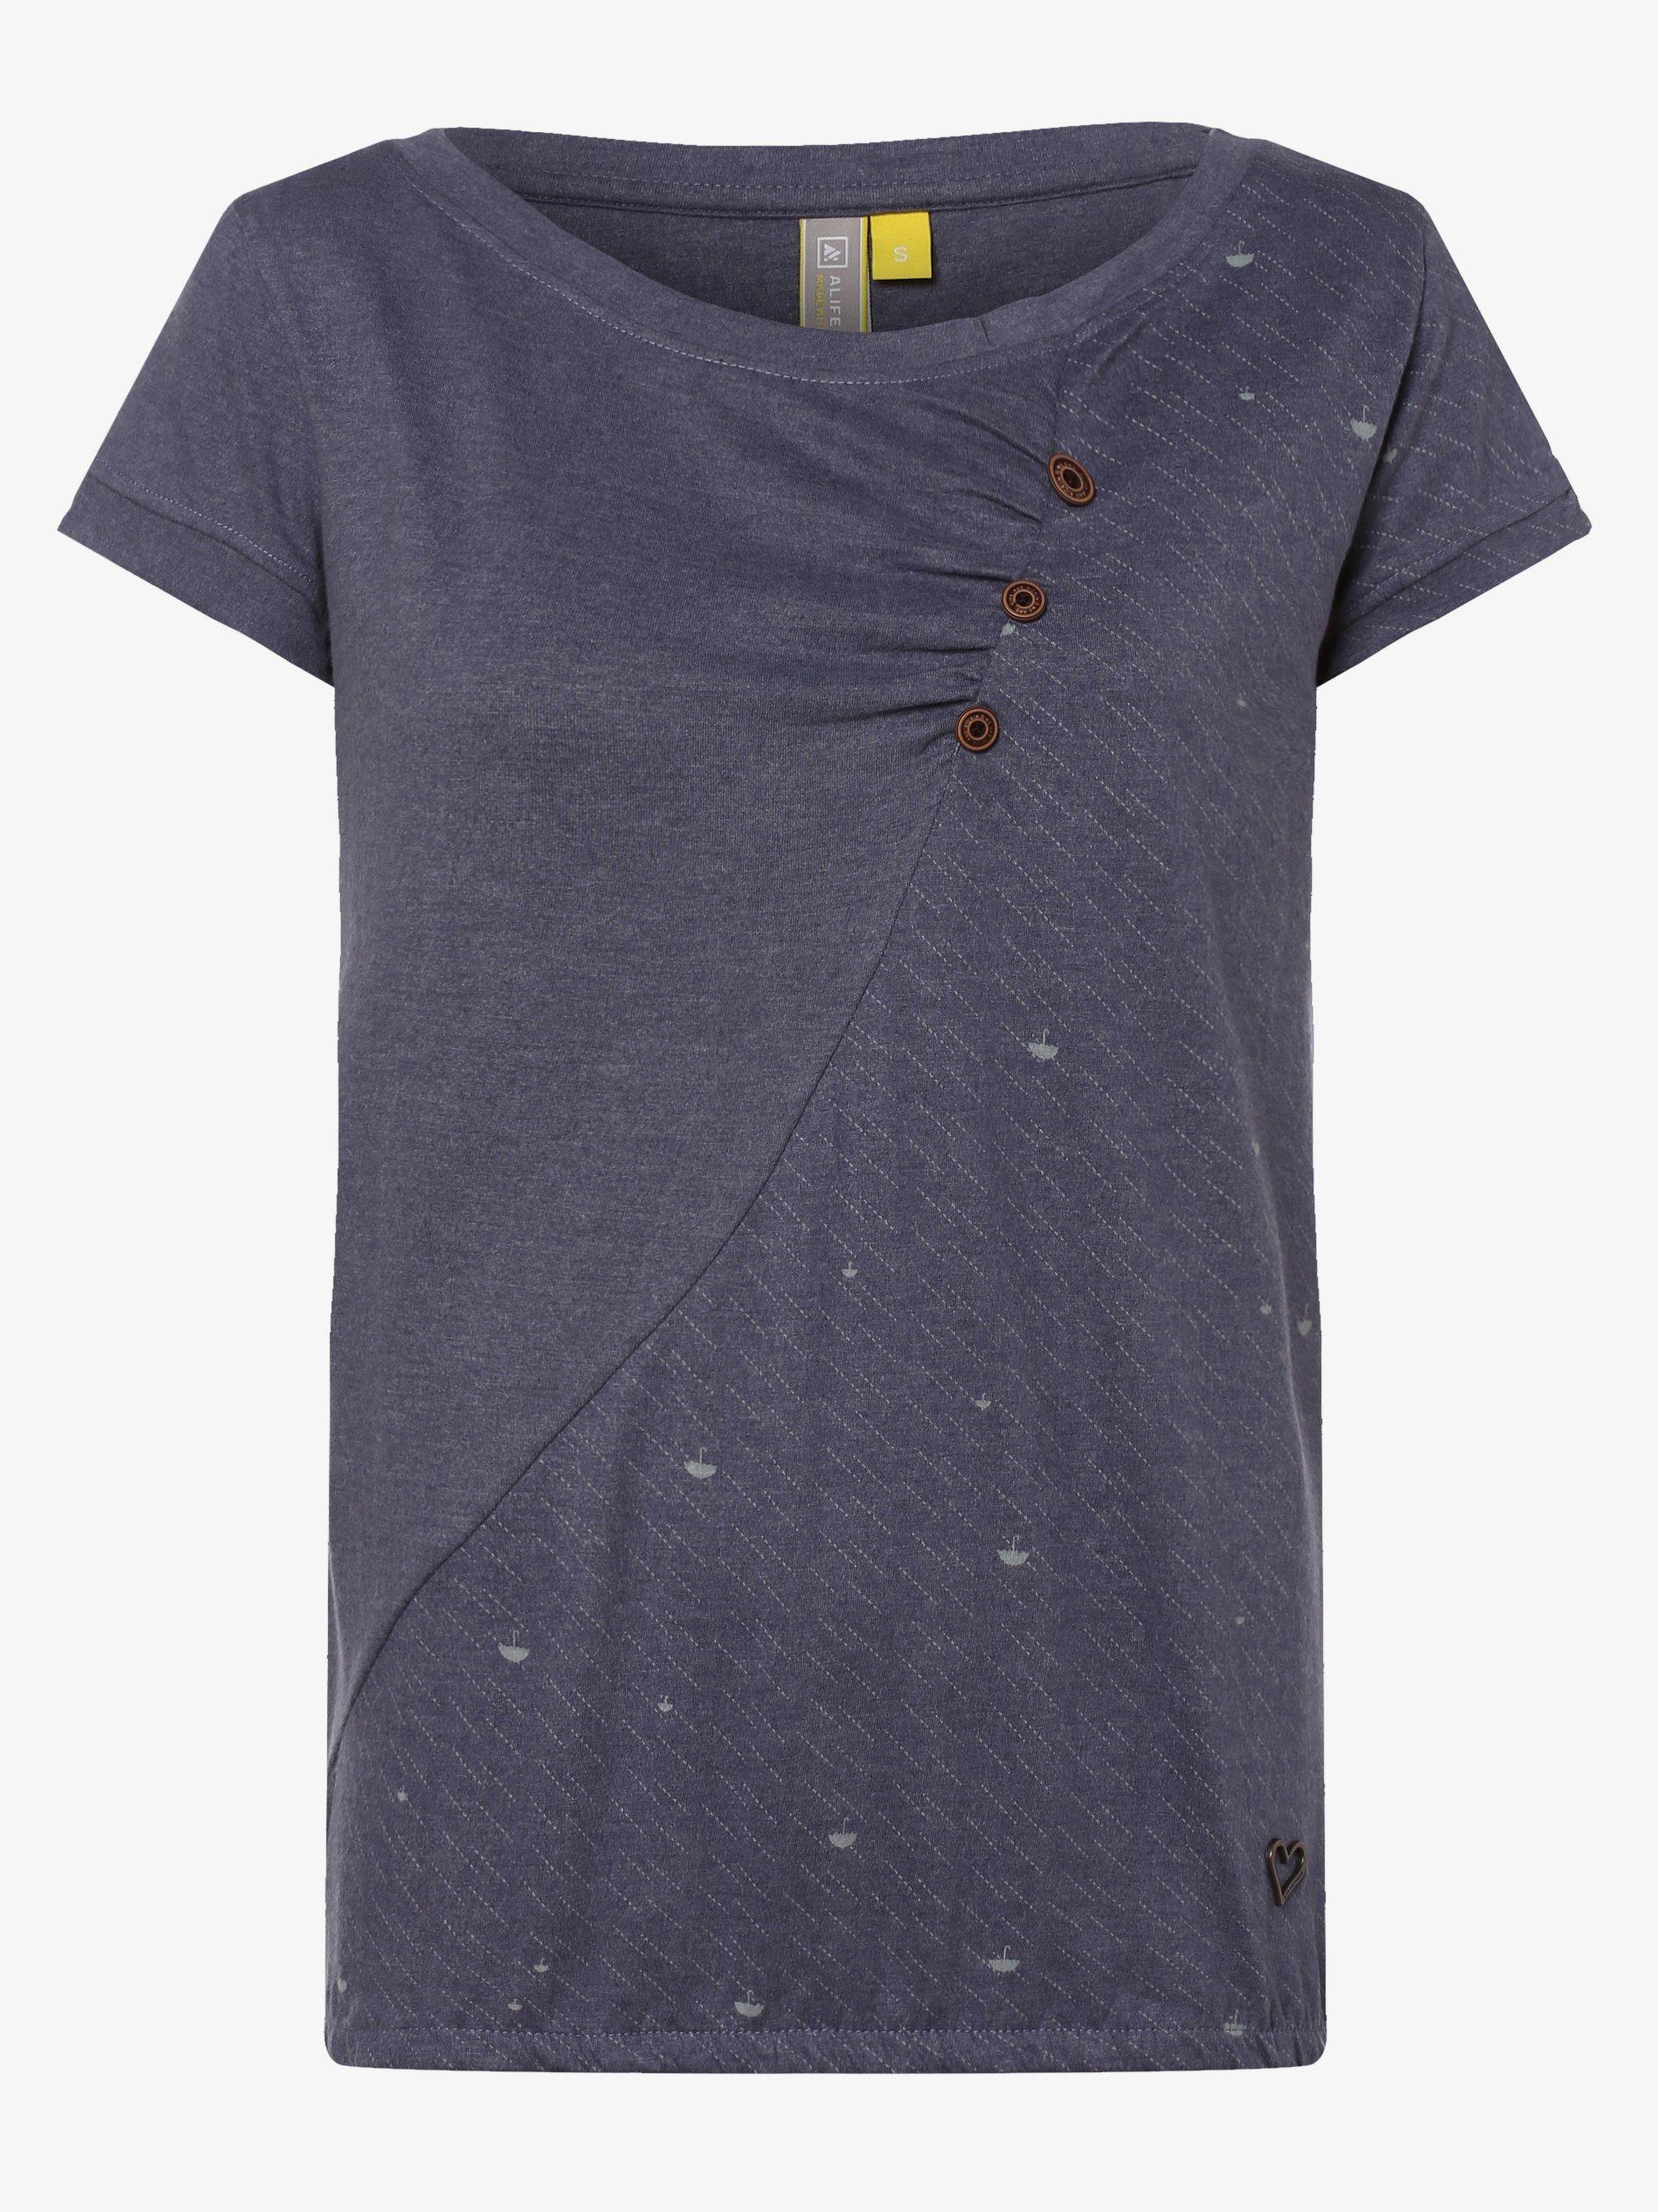 Alife& Kickin T-shirt damski – Zoe